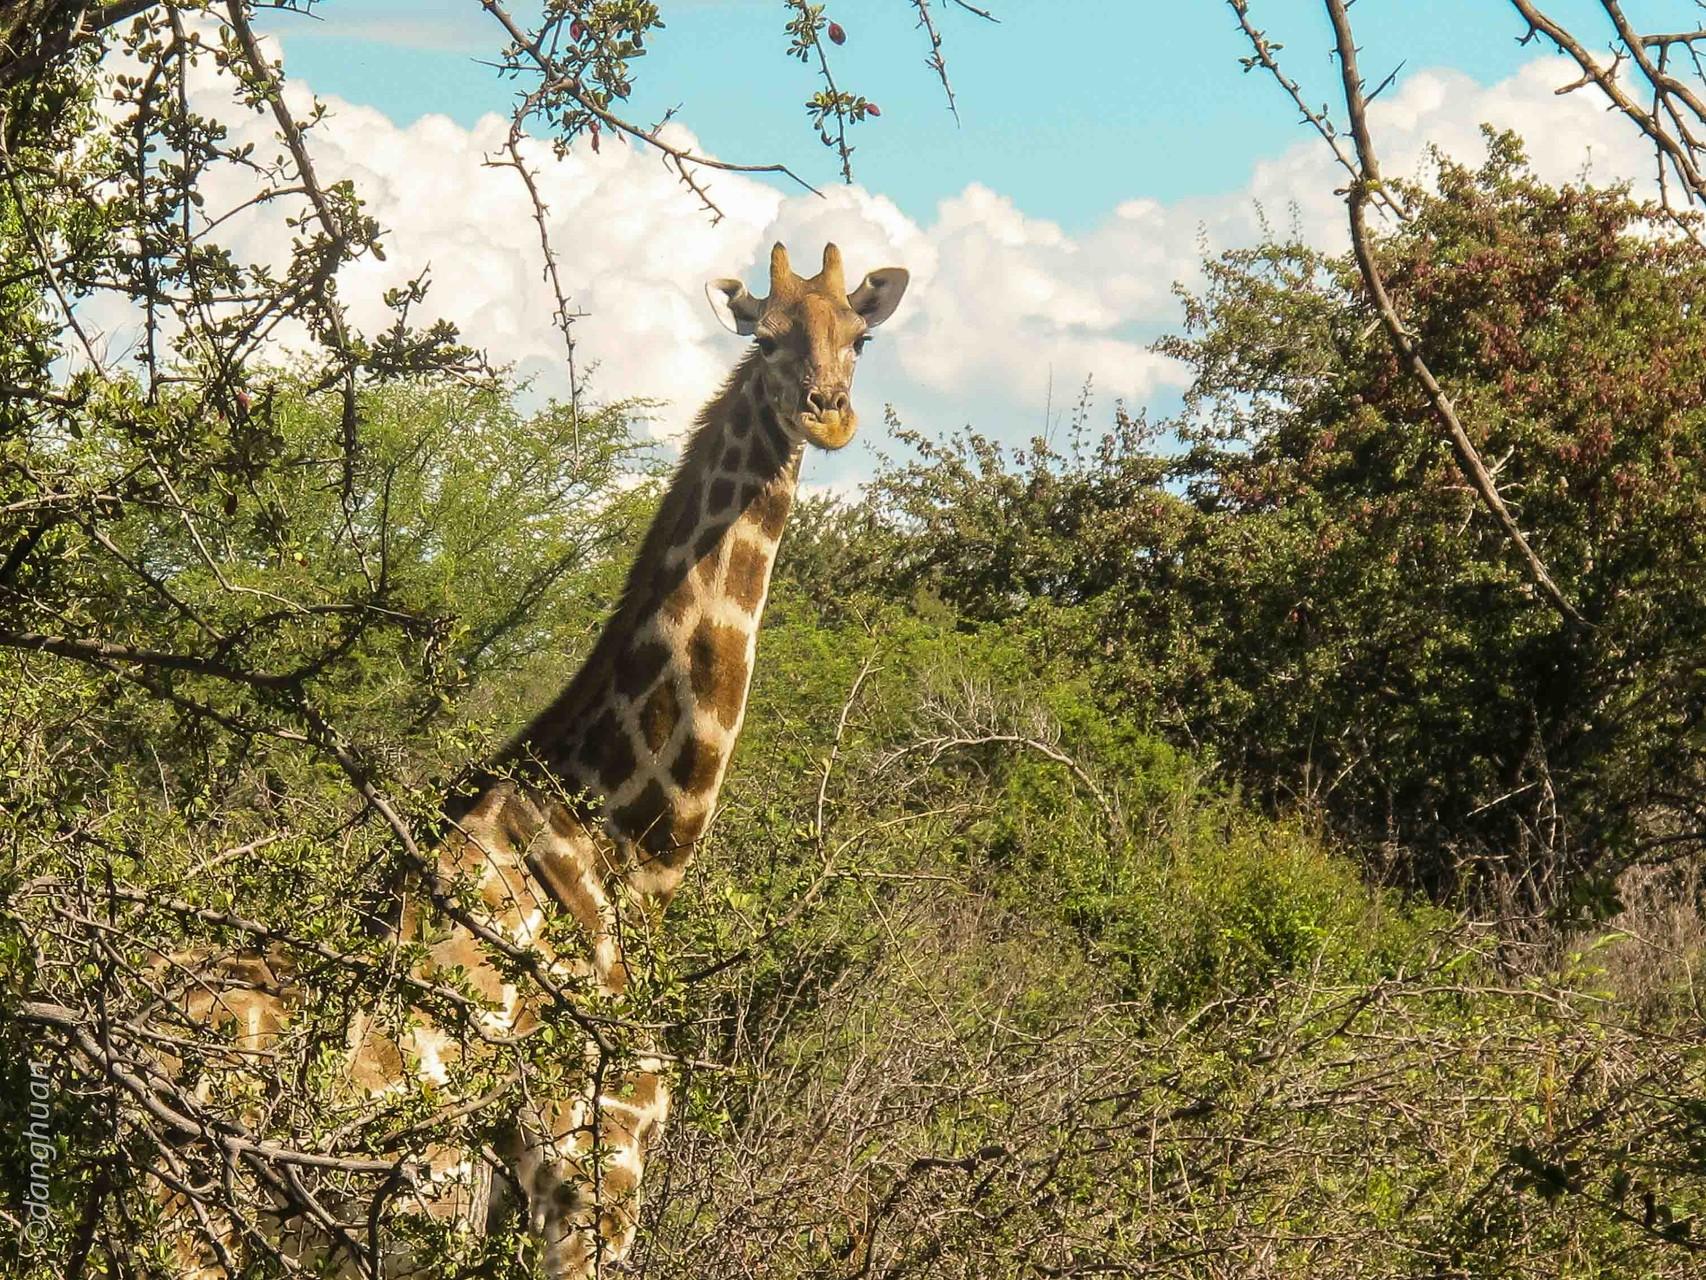 parc national d'Estosha - Namibie